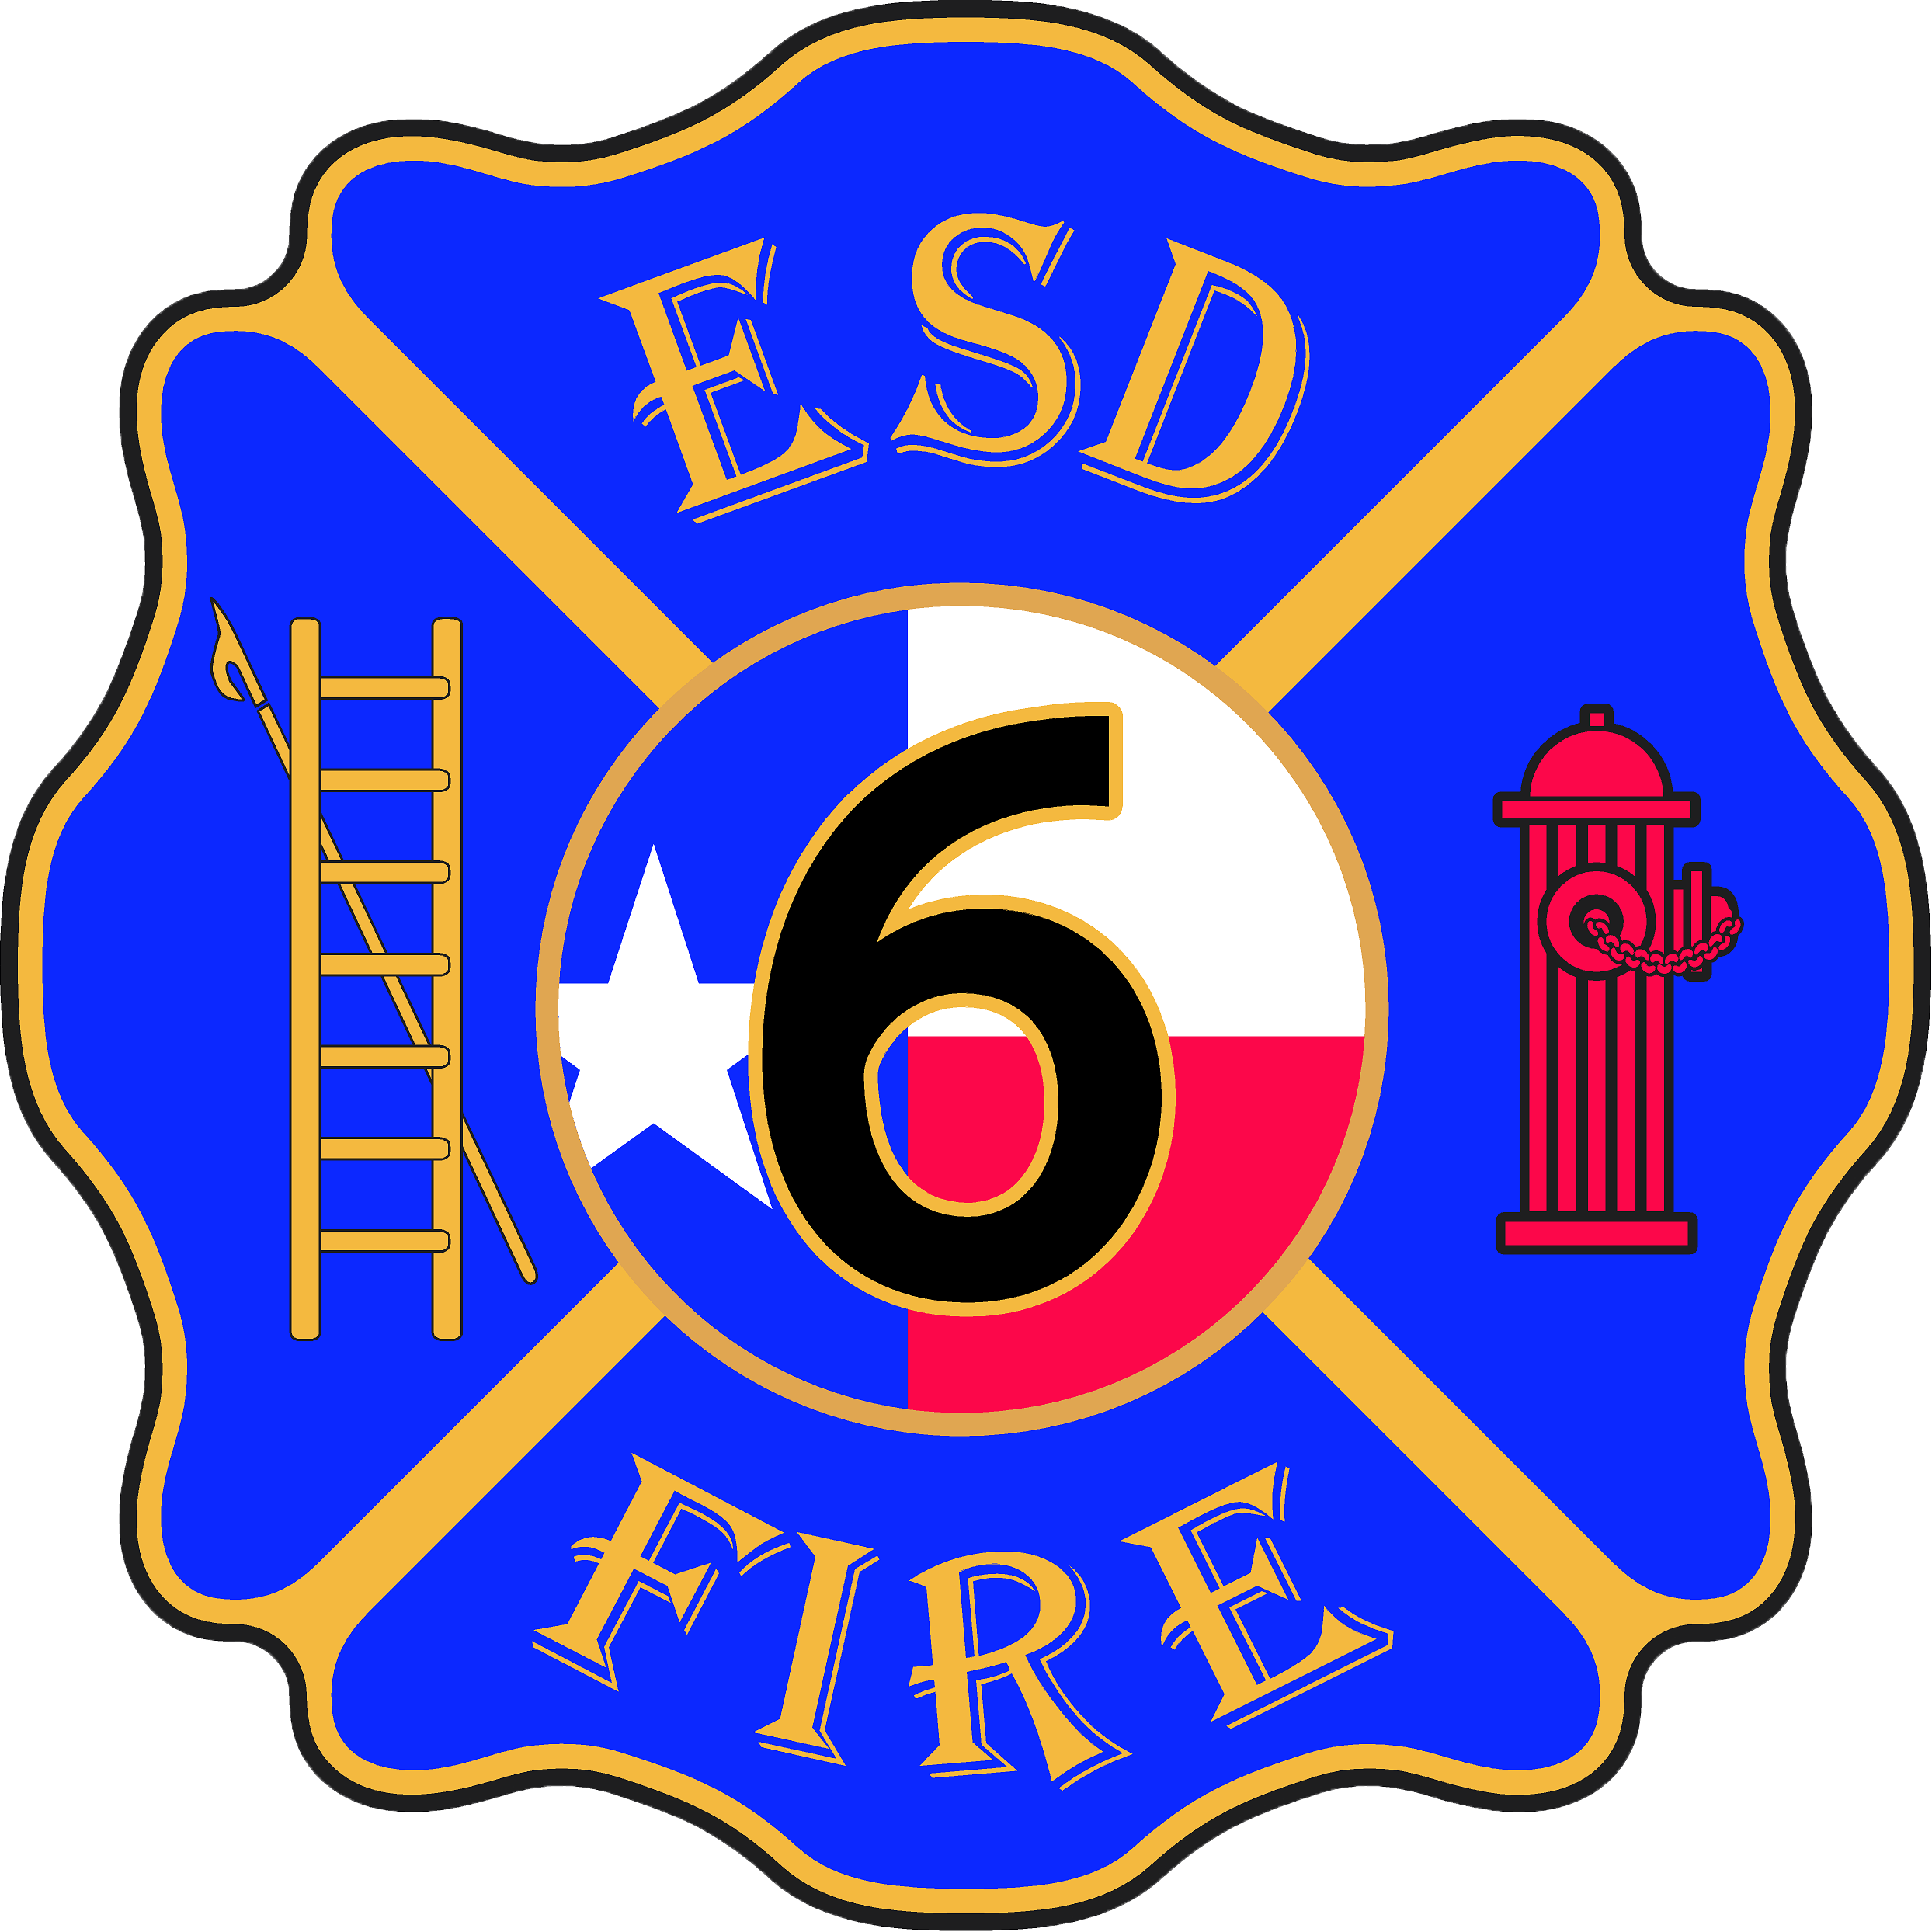 Ellis county ESD 6 5 14 2020 v2